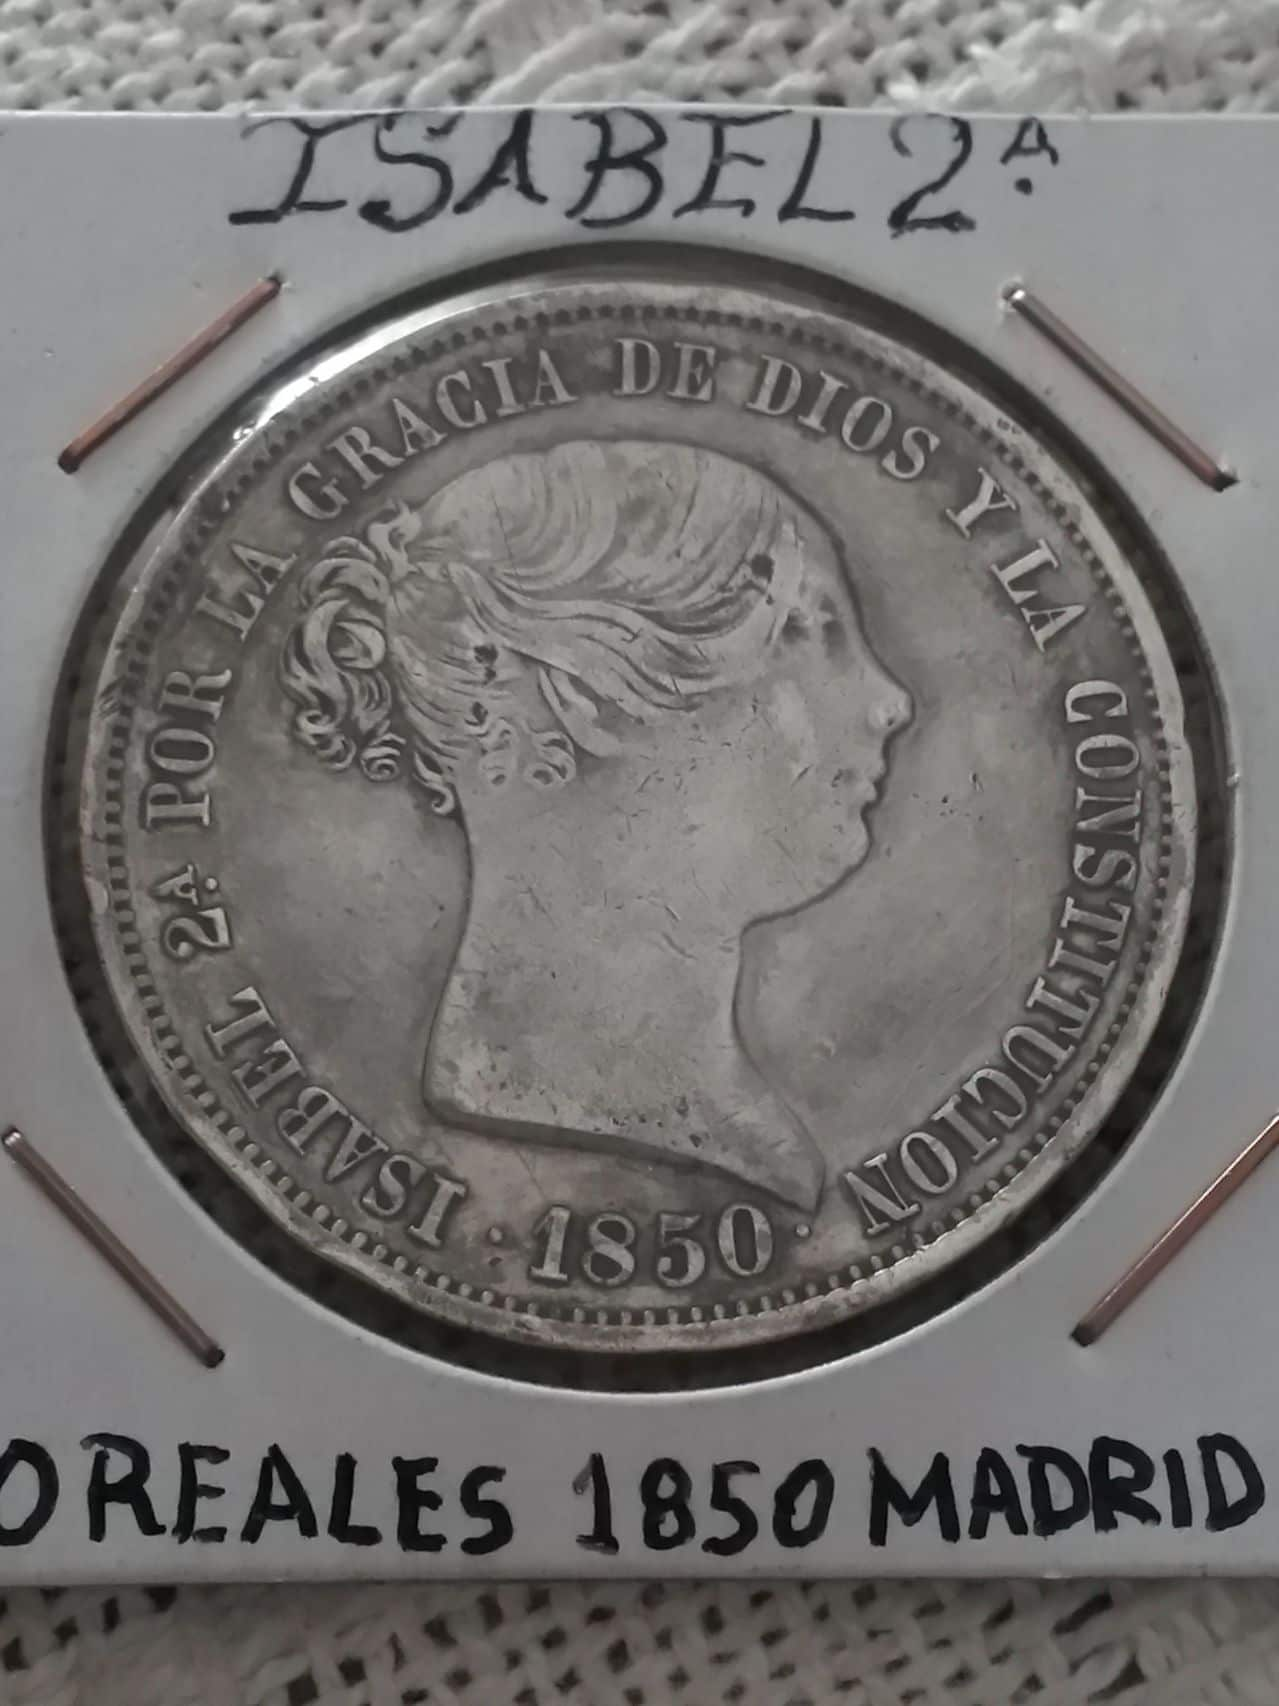 20 reales 1850 Madrid C.L. 20141015_165944_LLS